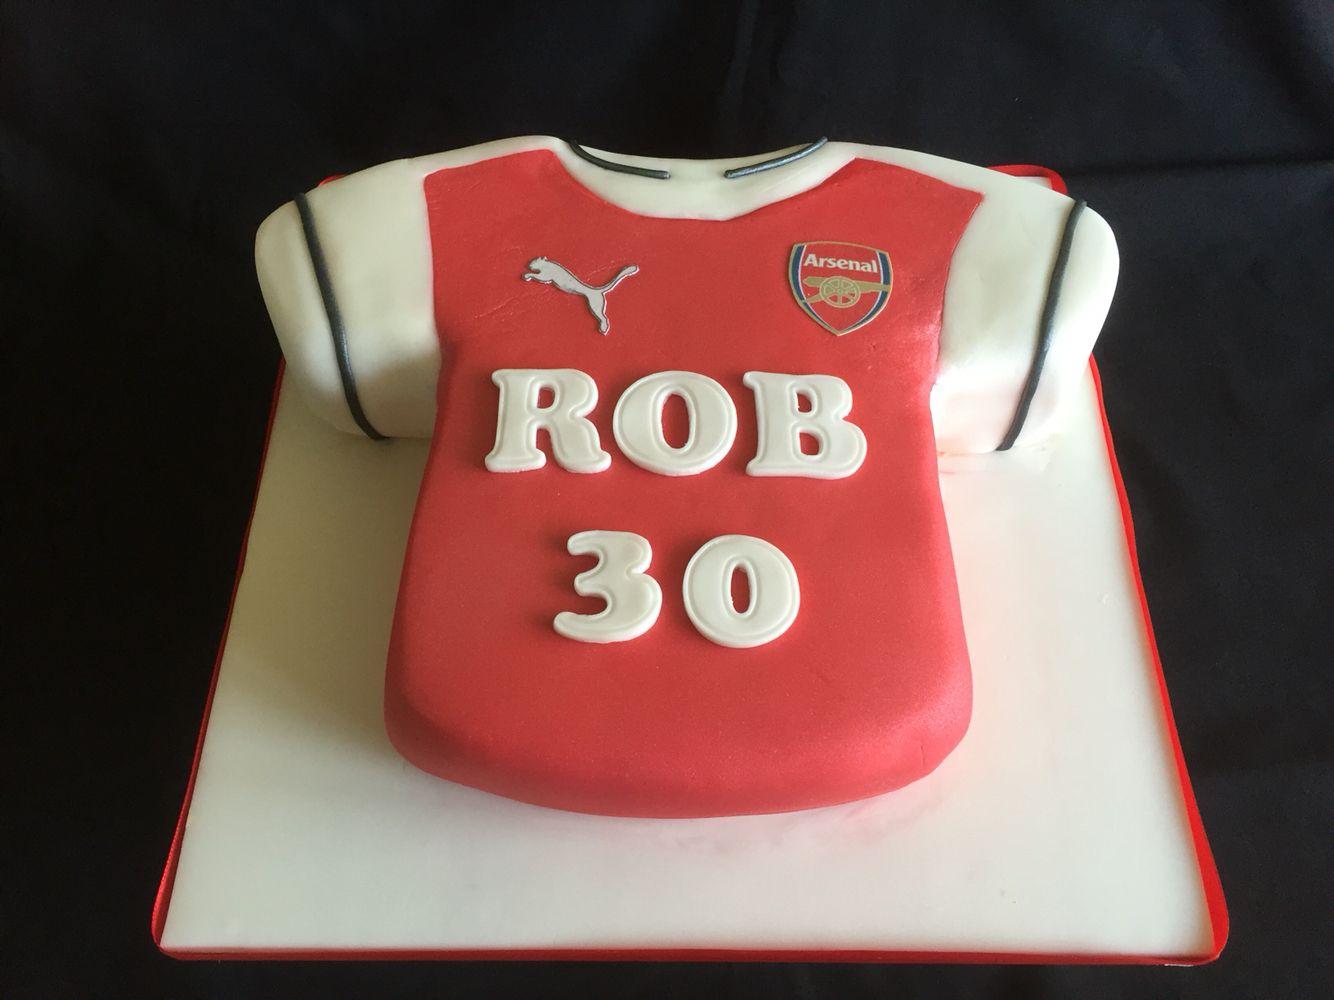 Arsenal Football Th Birthday Cake TShirt Cake Designs - Birthday cake shirt